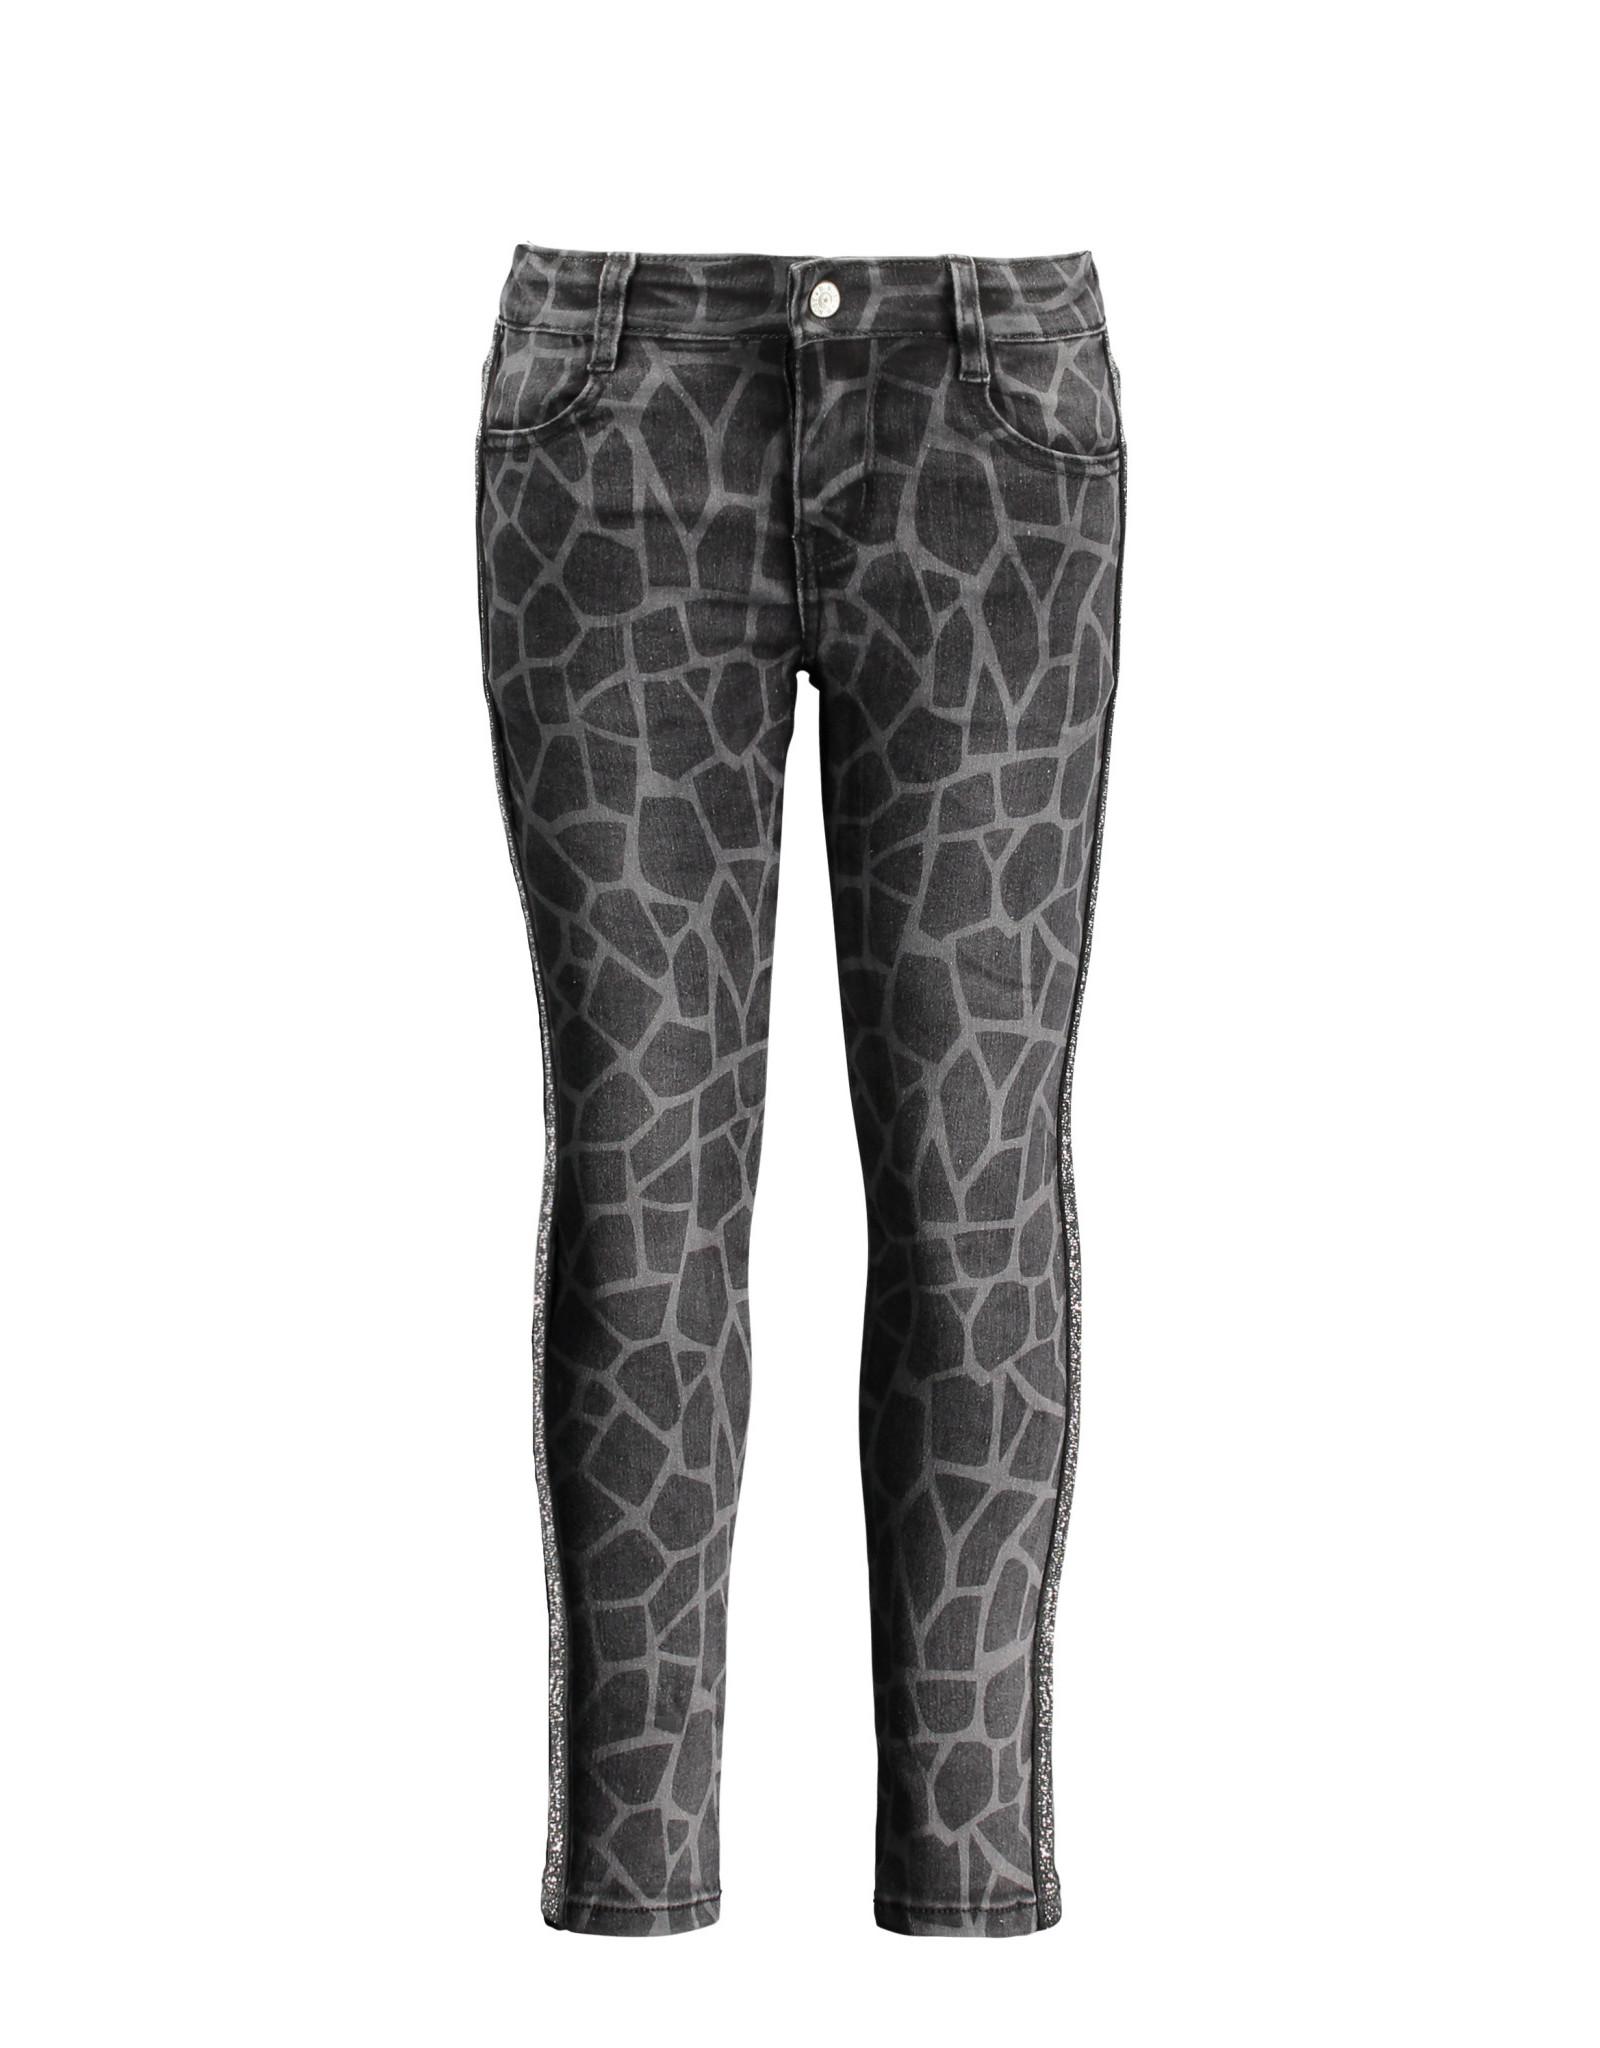 B.Nosy B.Nosy meisjes jeans Giraffe Denim